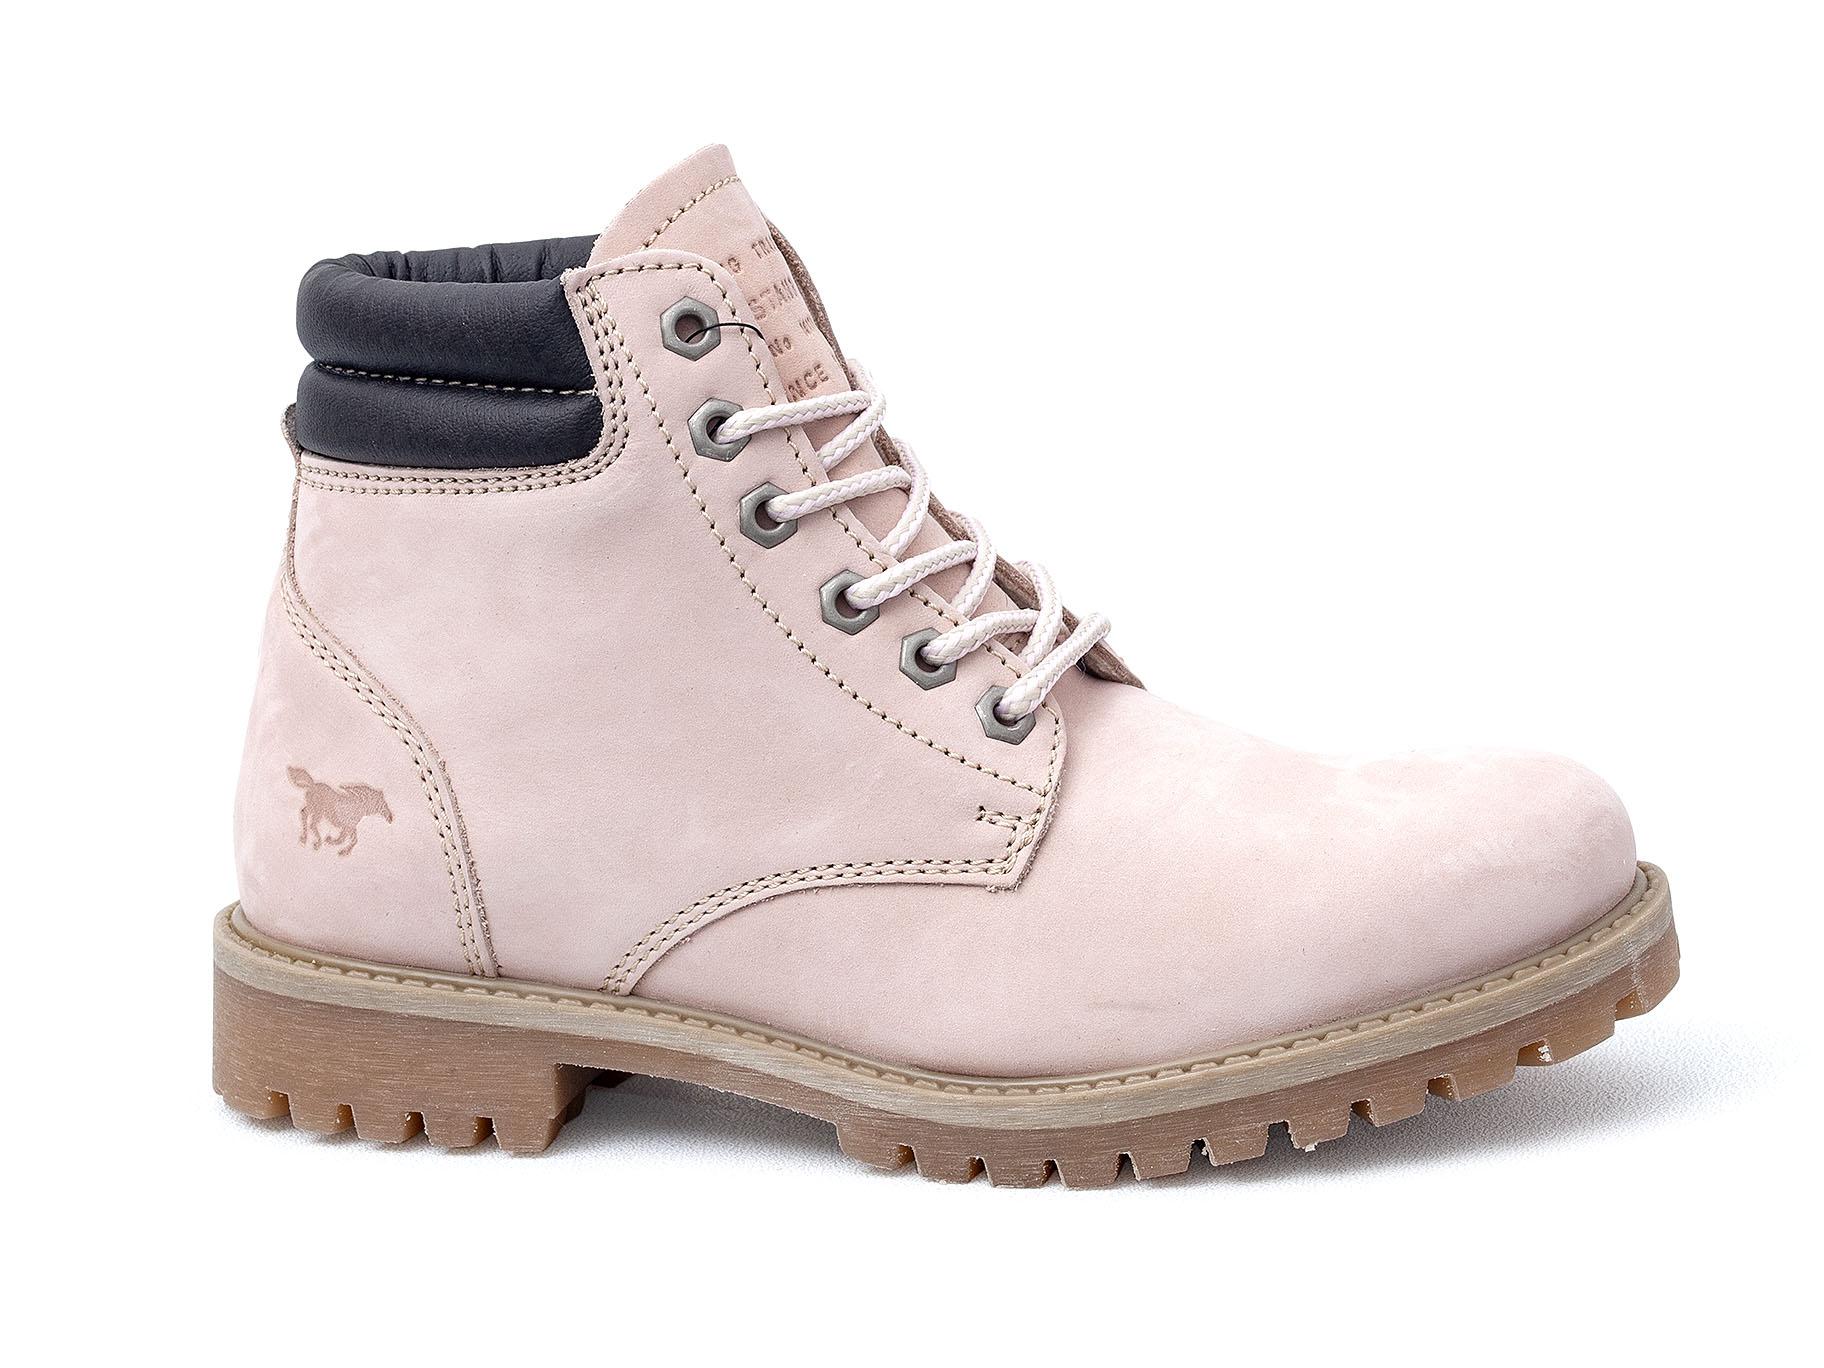 mustang bottes femme 43c-040